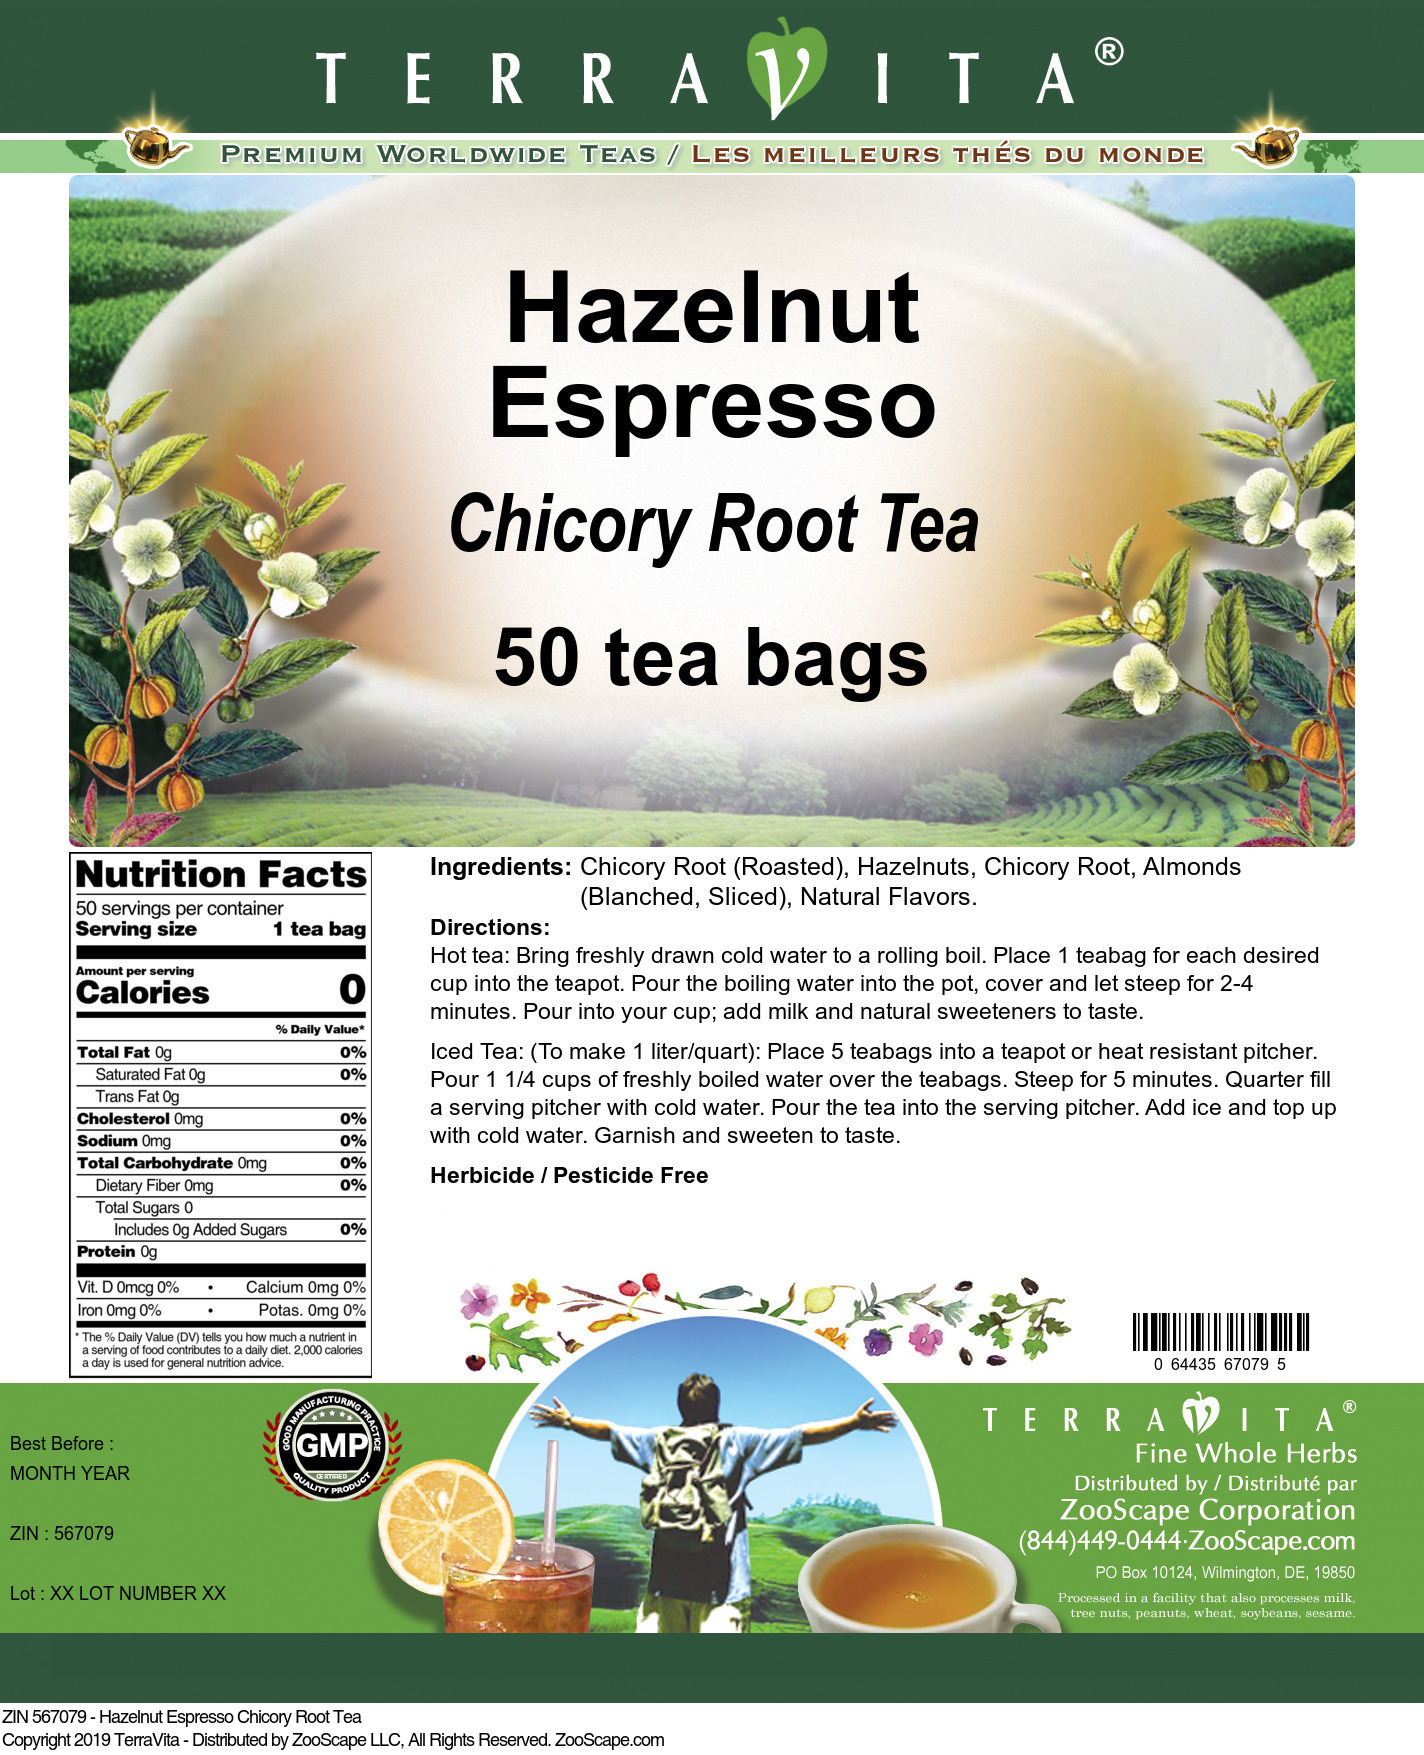 Hazelnut Espresso Chicory Root